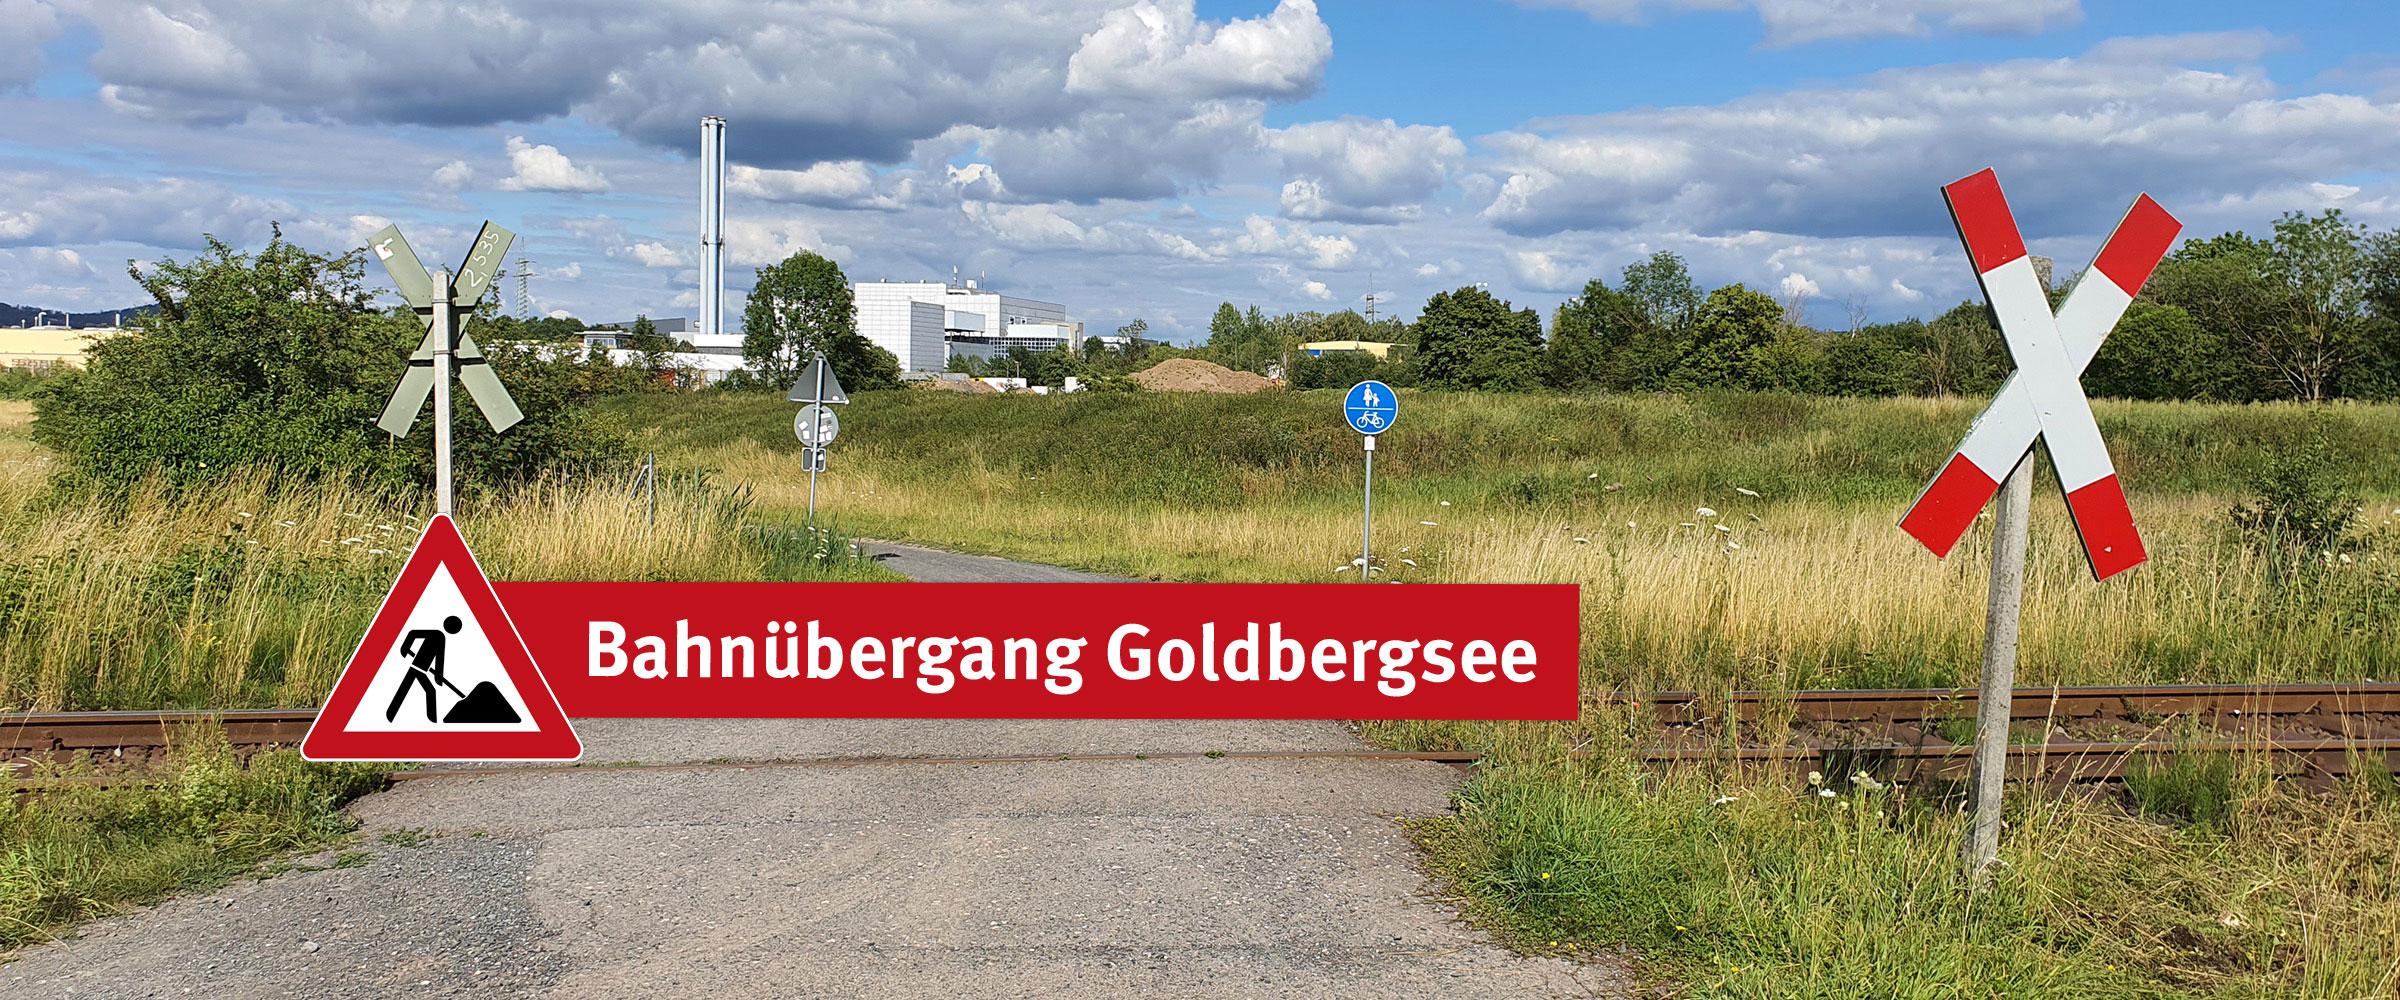 banner_bahnuebergang_goldbergsee